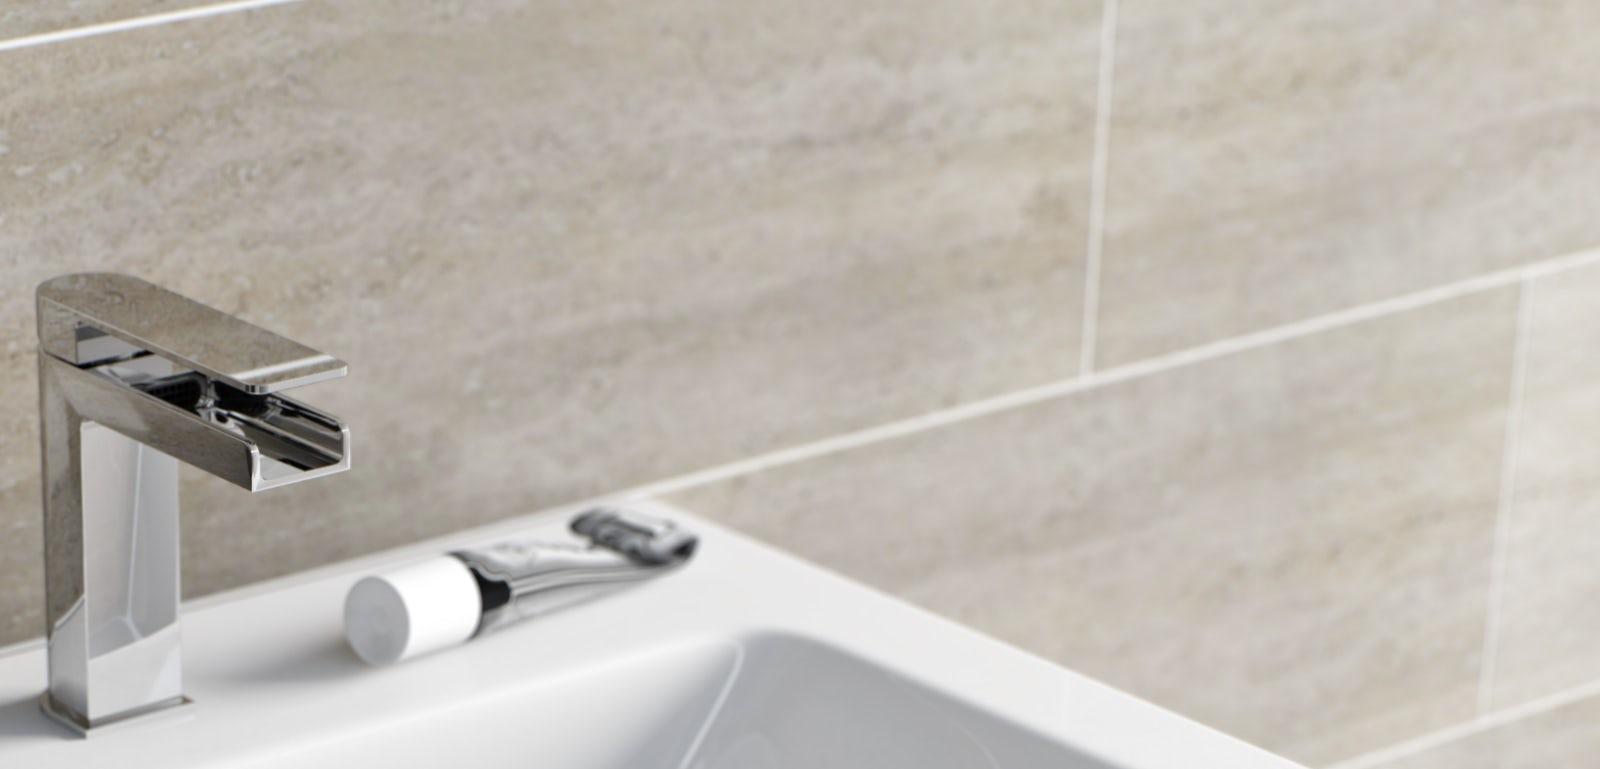 5 benefits of using mixer taps in the bathroom